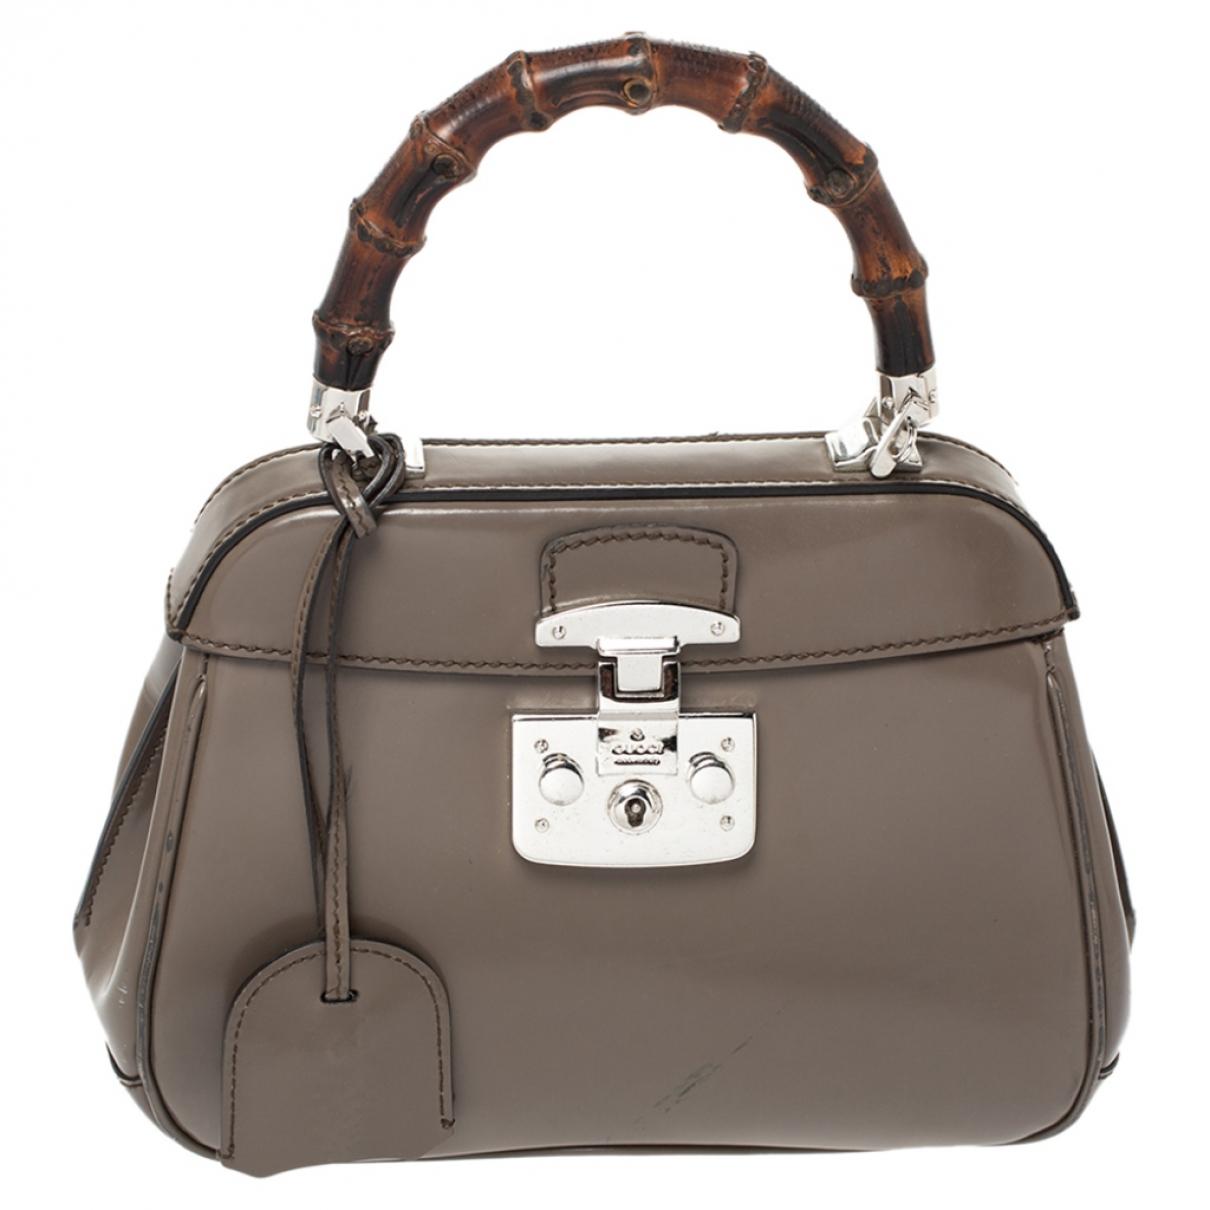 Gucci Bamboo Grey Leather handbag for Women N